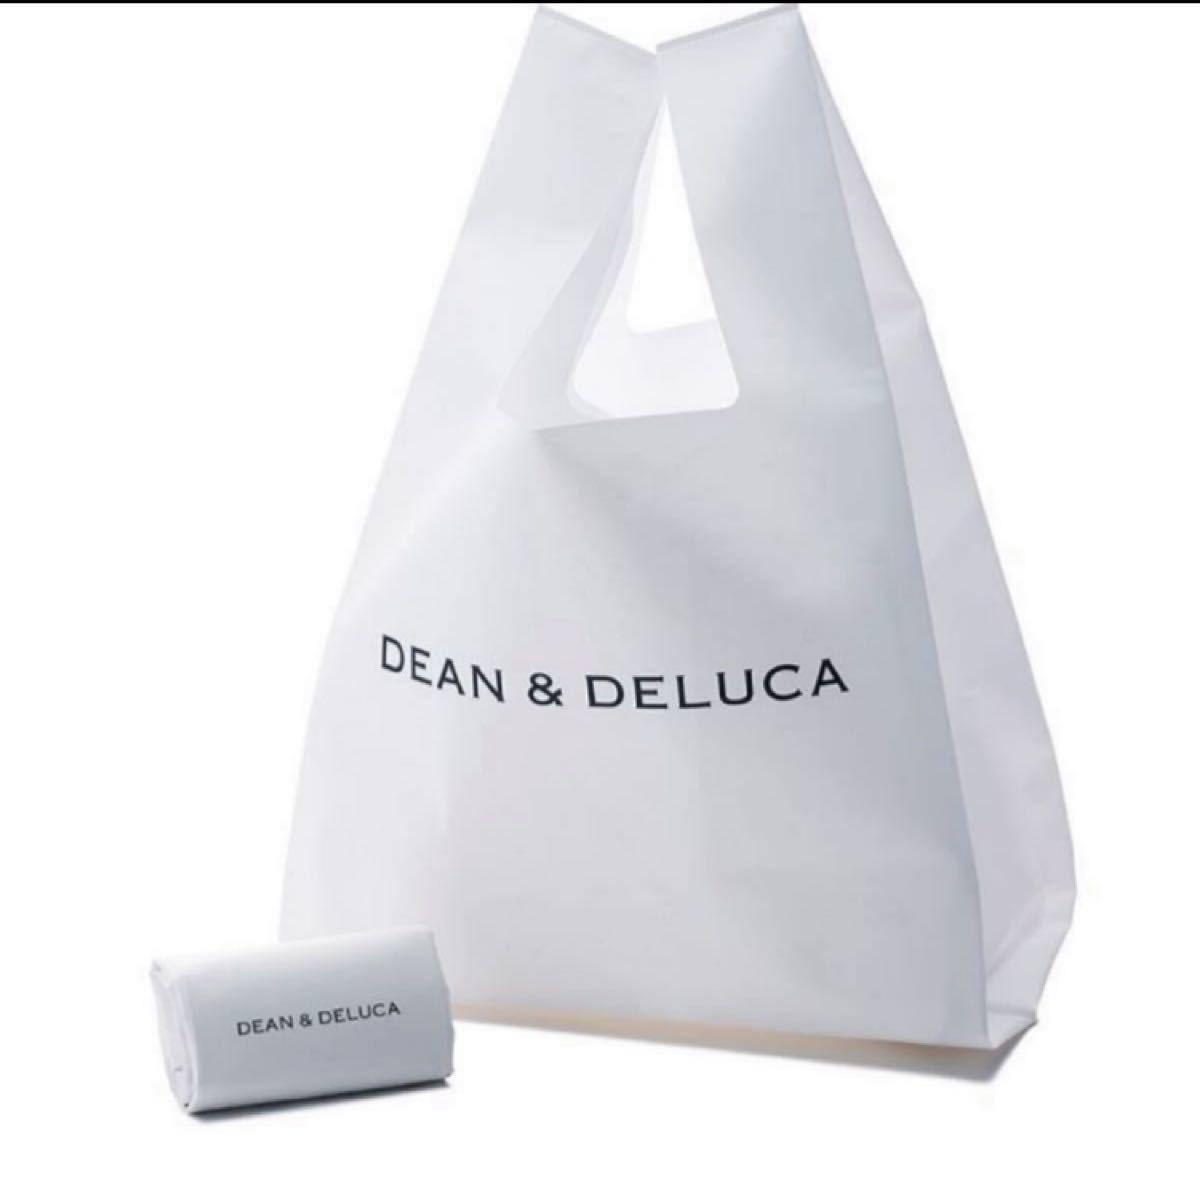 DEAN&DELUCA ミニマムエコバッグ ディーン&デルーカ ショッピングバッグ エコバッグ 新品未使用